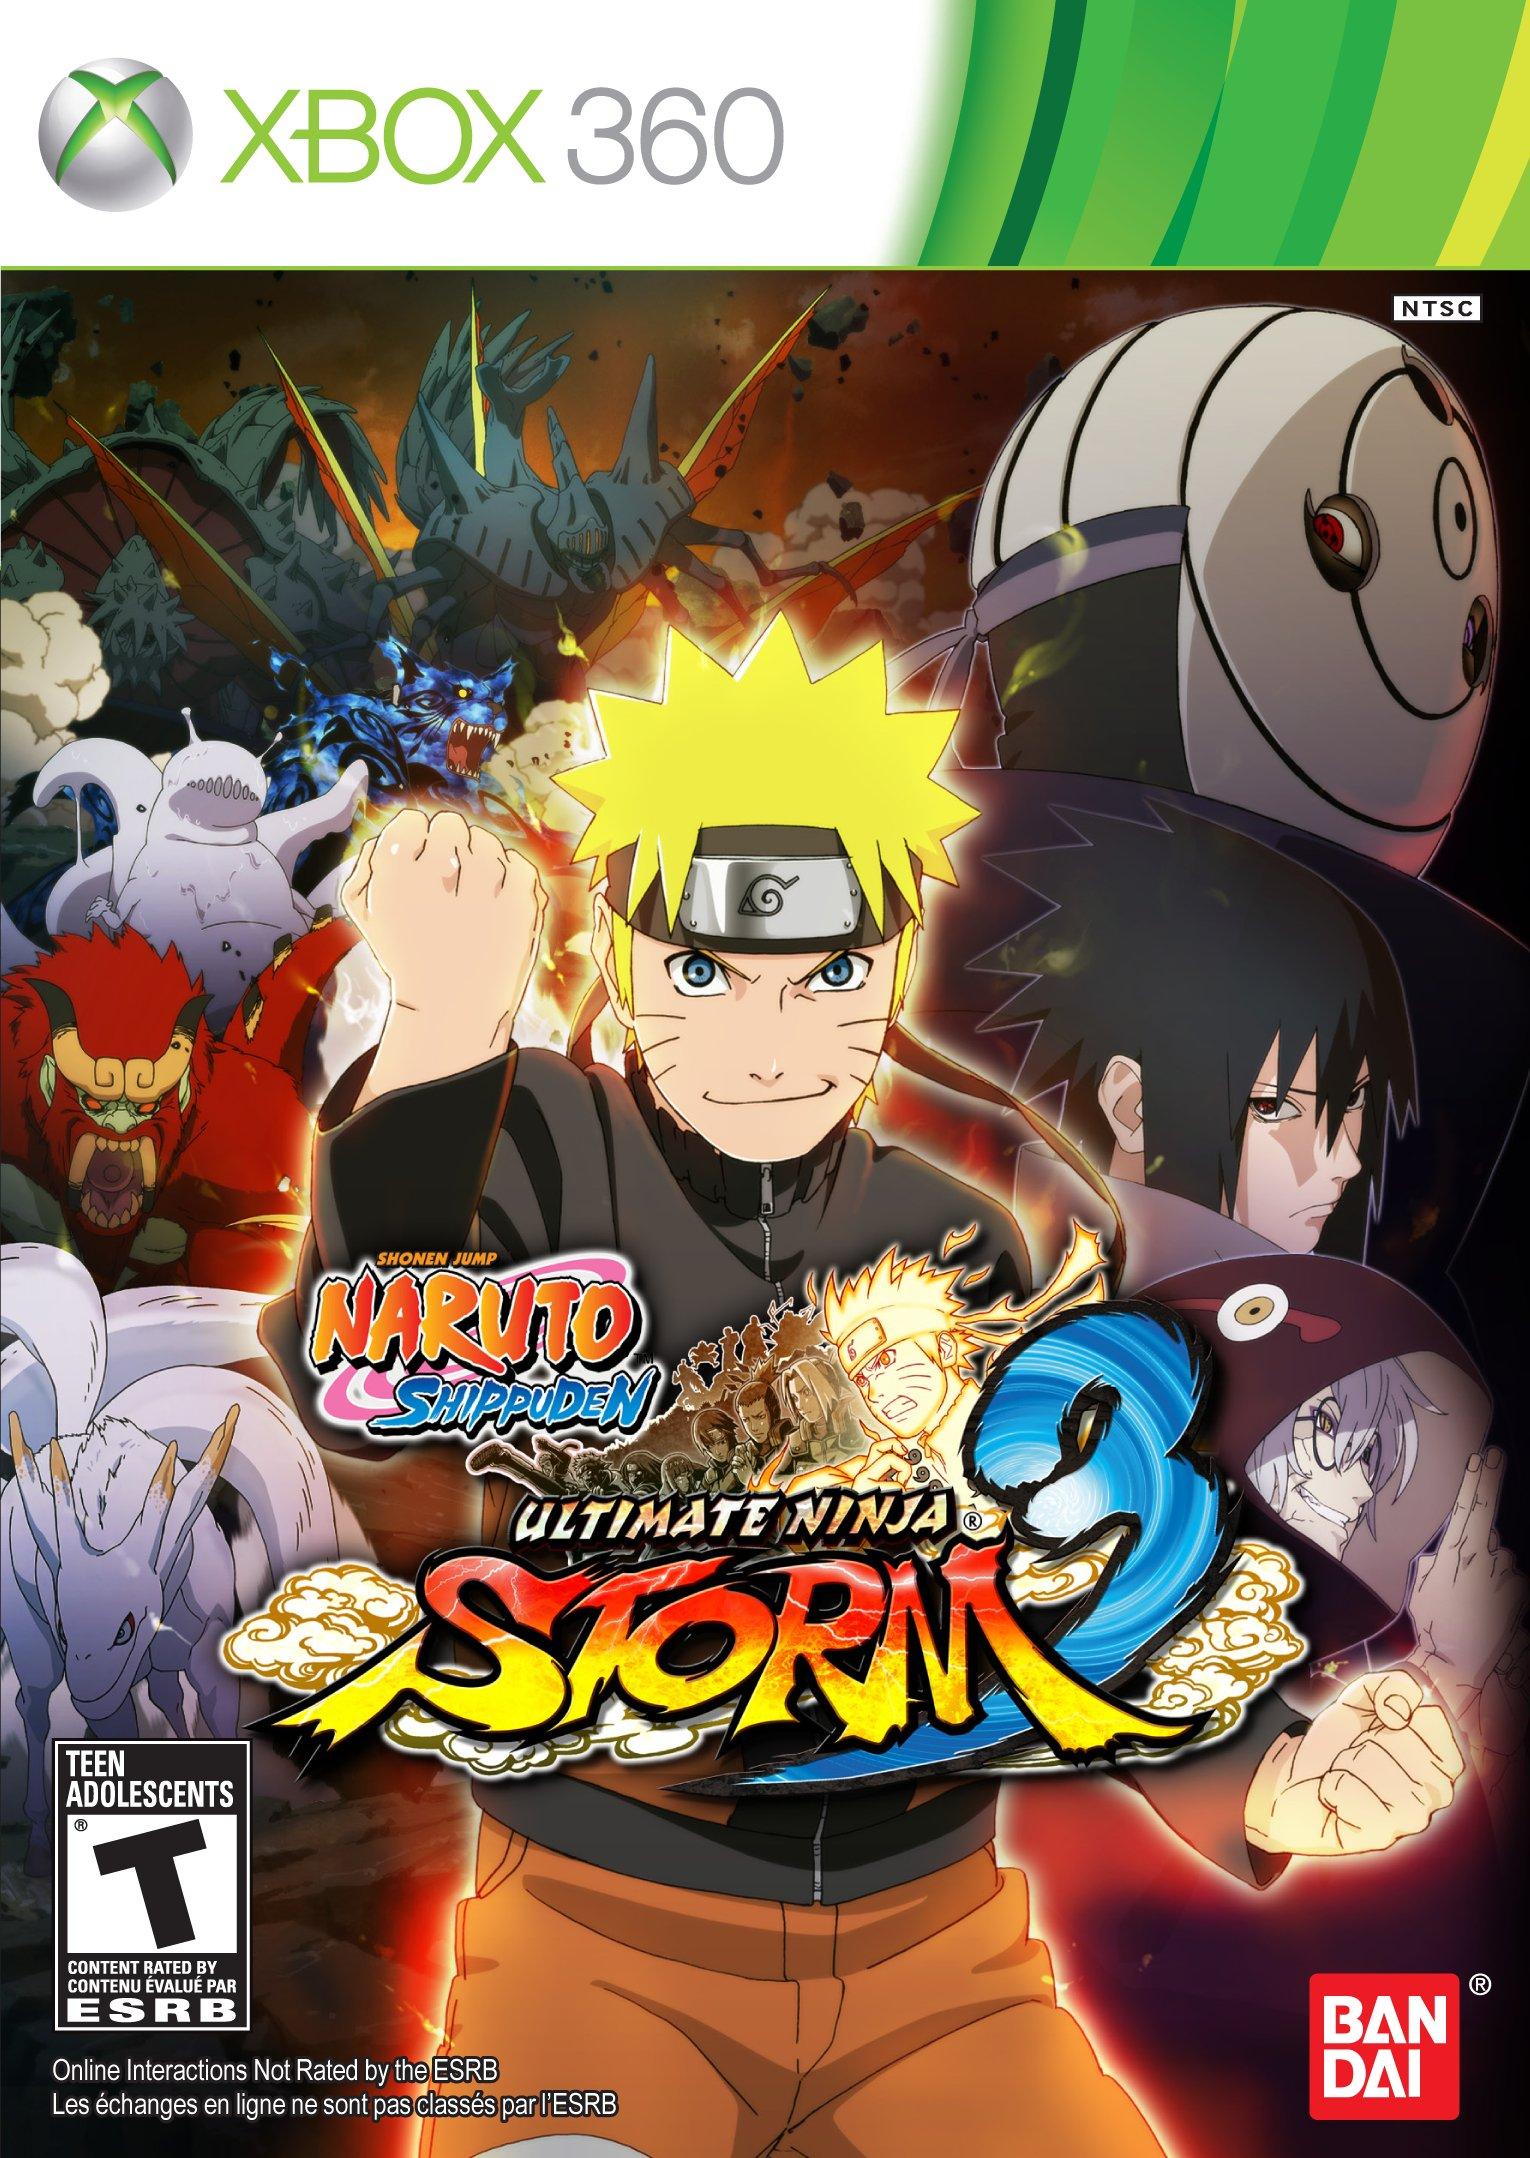 Naruto-Shippuden-Ultimate-Ninja-Storm-3 copertina xbox 360